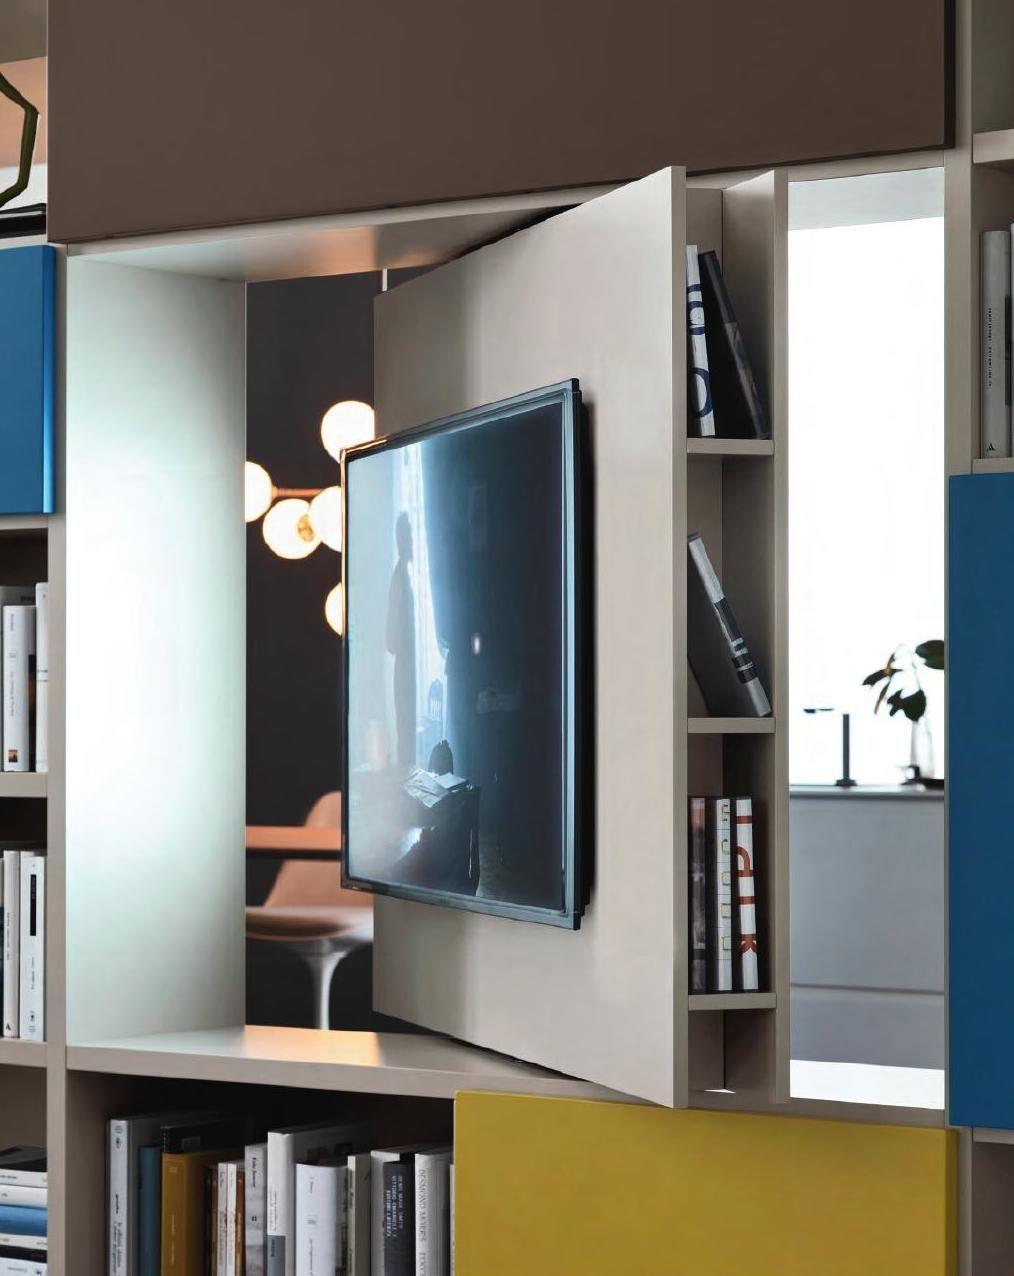 modo raumtrenner raumteiler f r kleine r ume. Black Bedroom Furniture Sets. Home Design Ideas